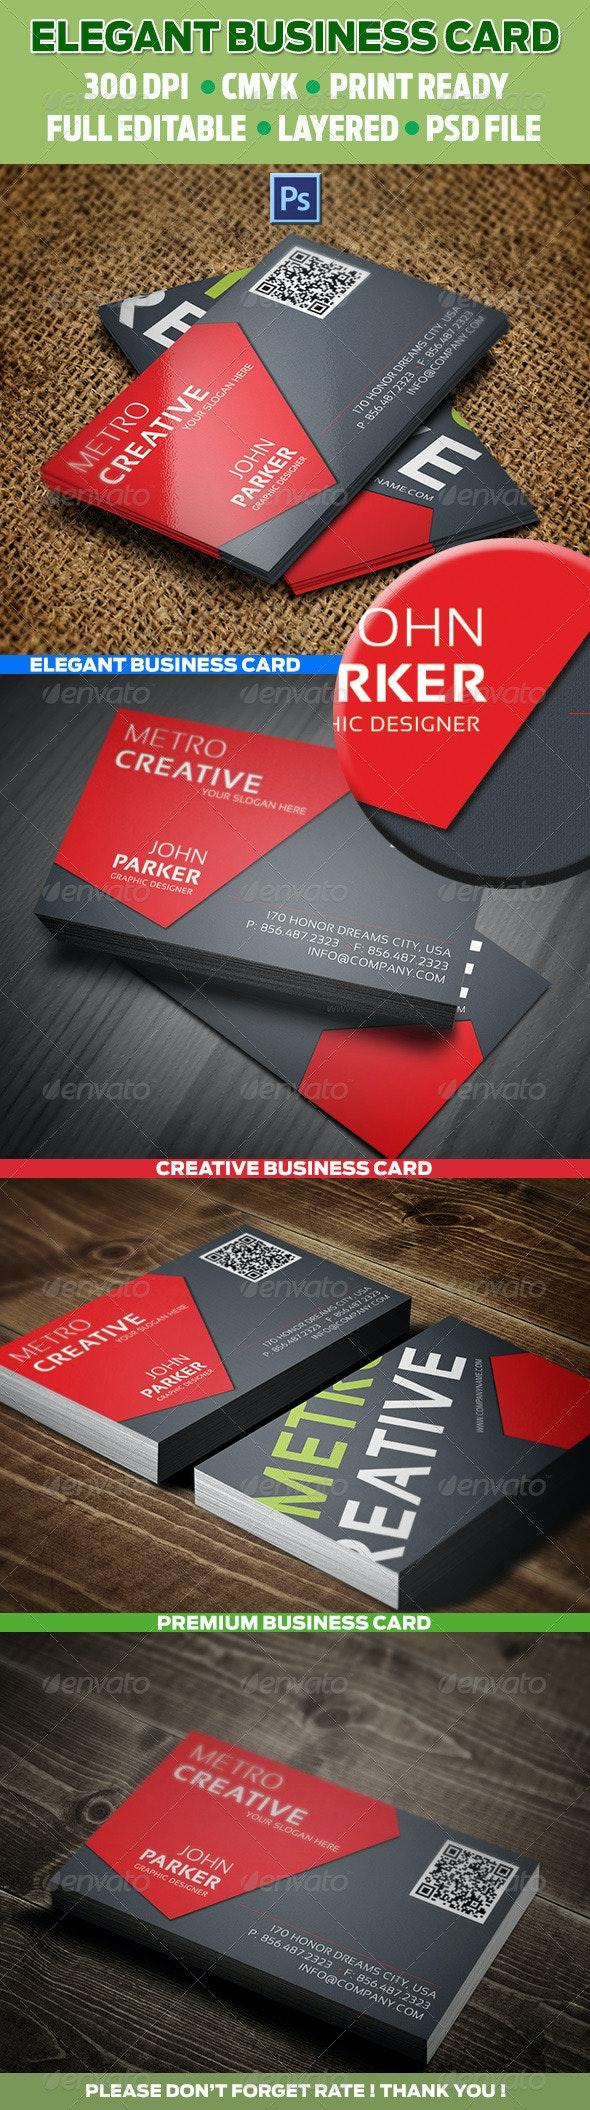 Creative Business Cards 19 - Creative Business Cards